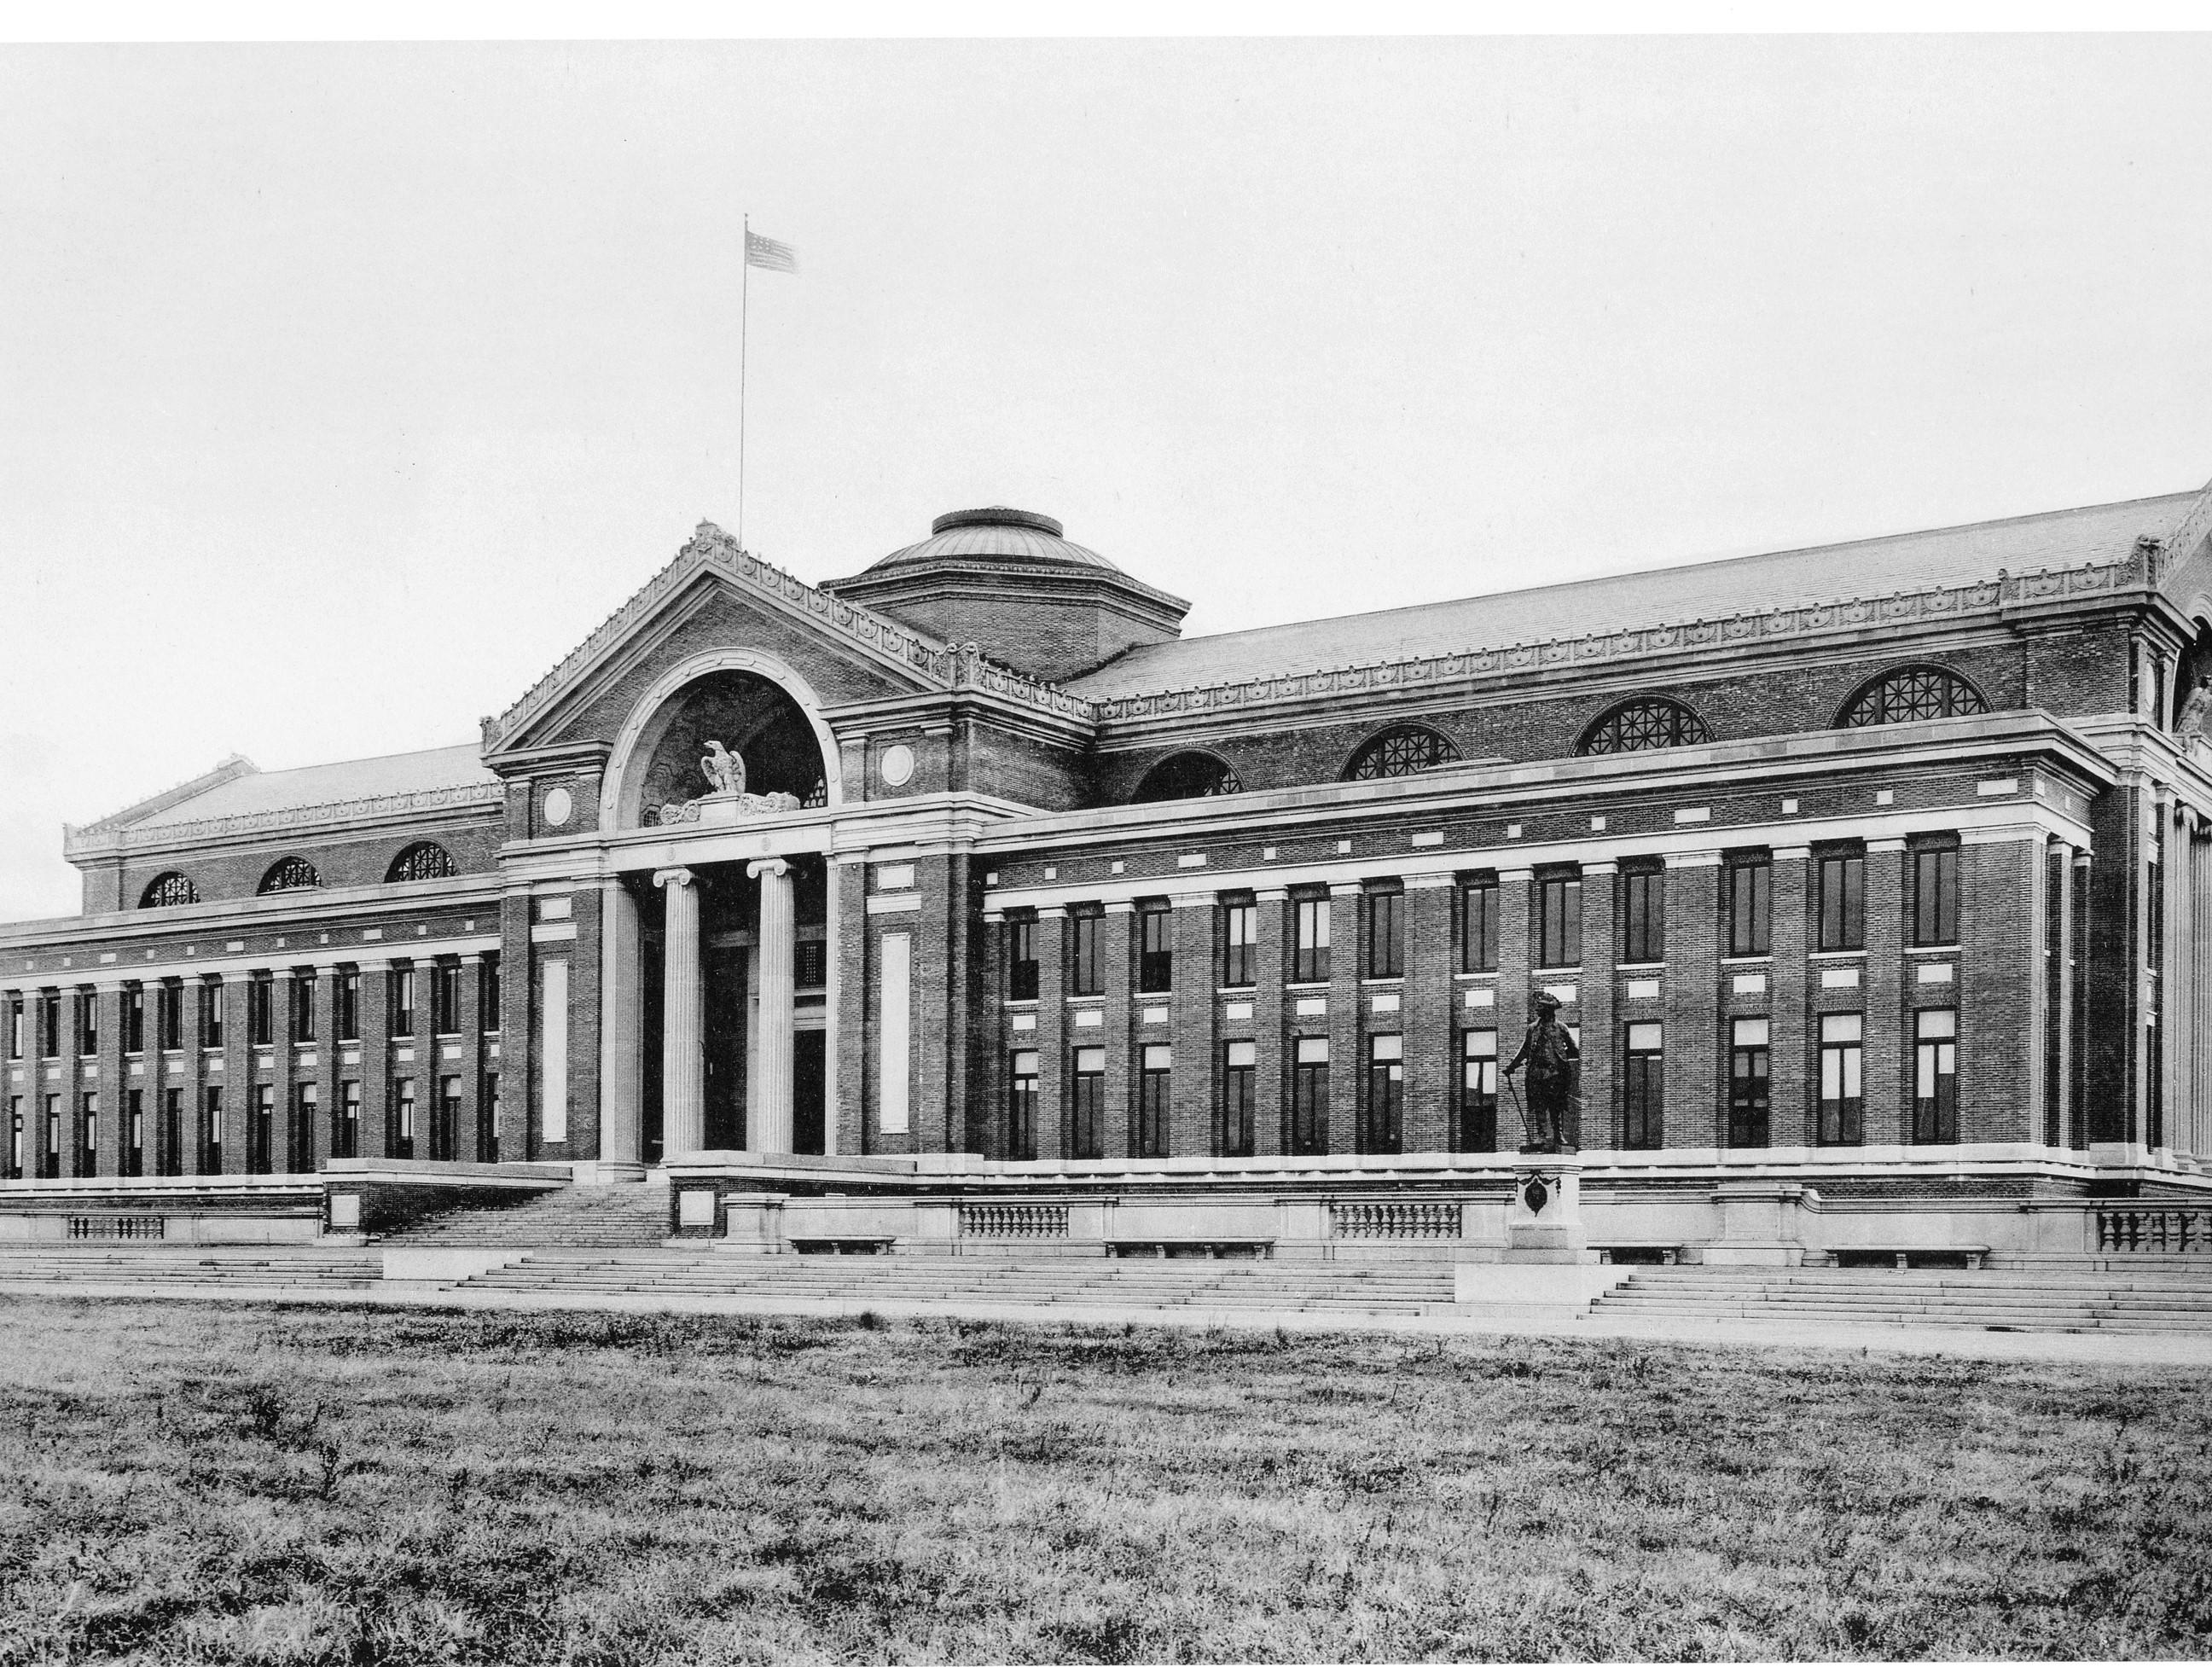 McKim, Mead & White, Army War College